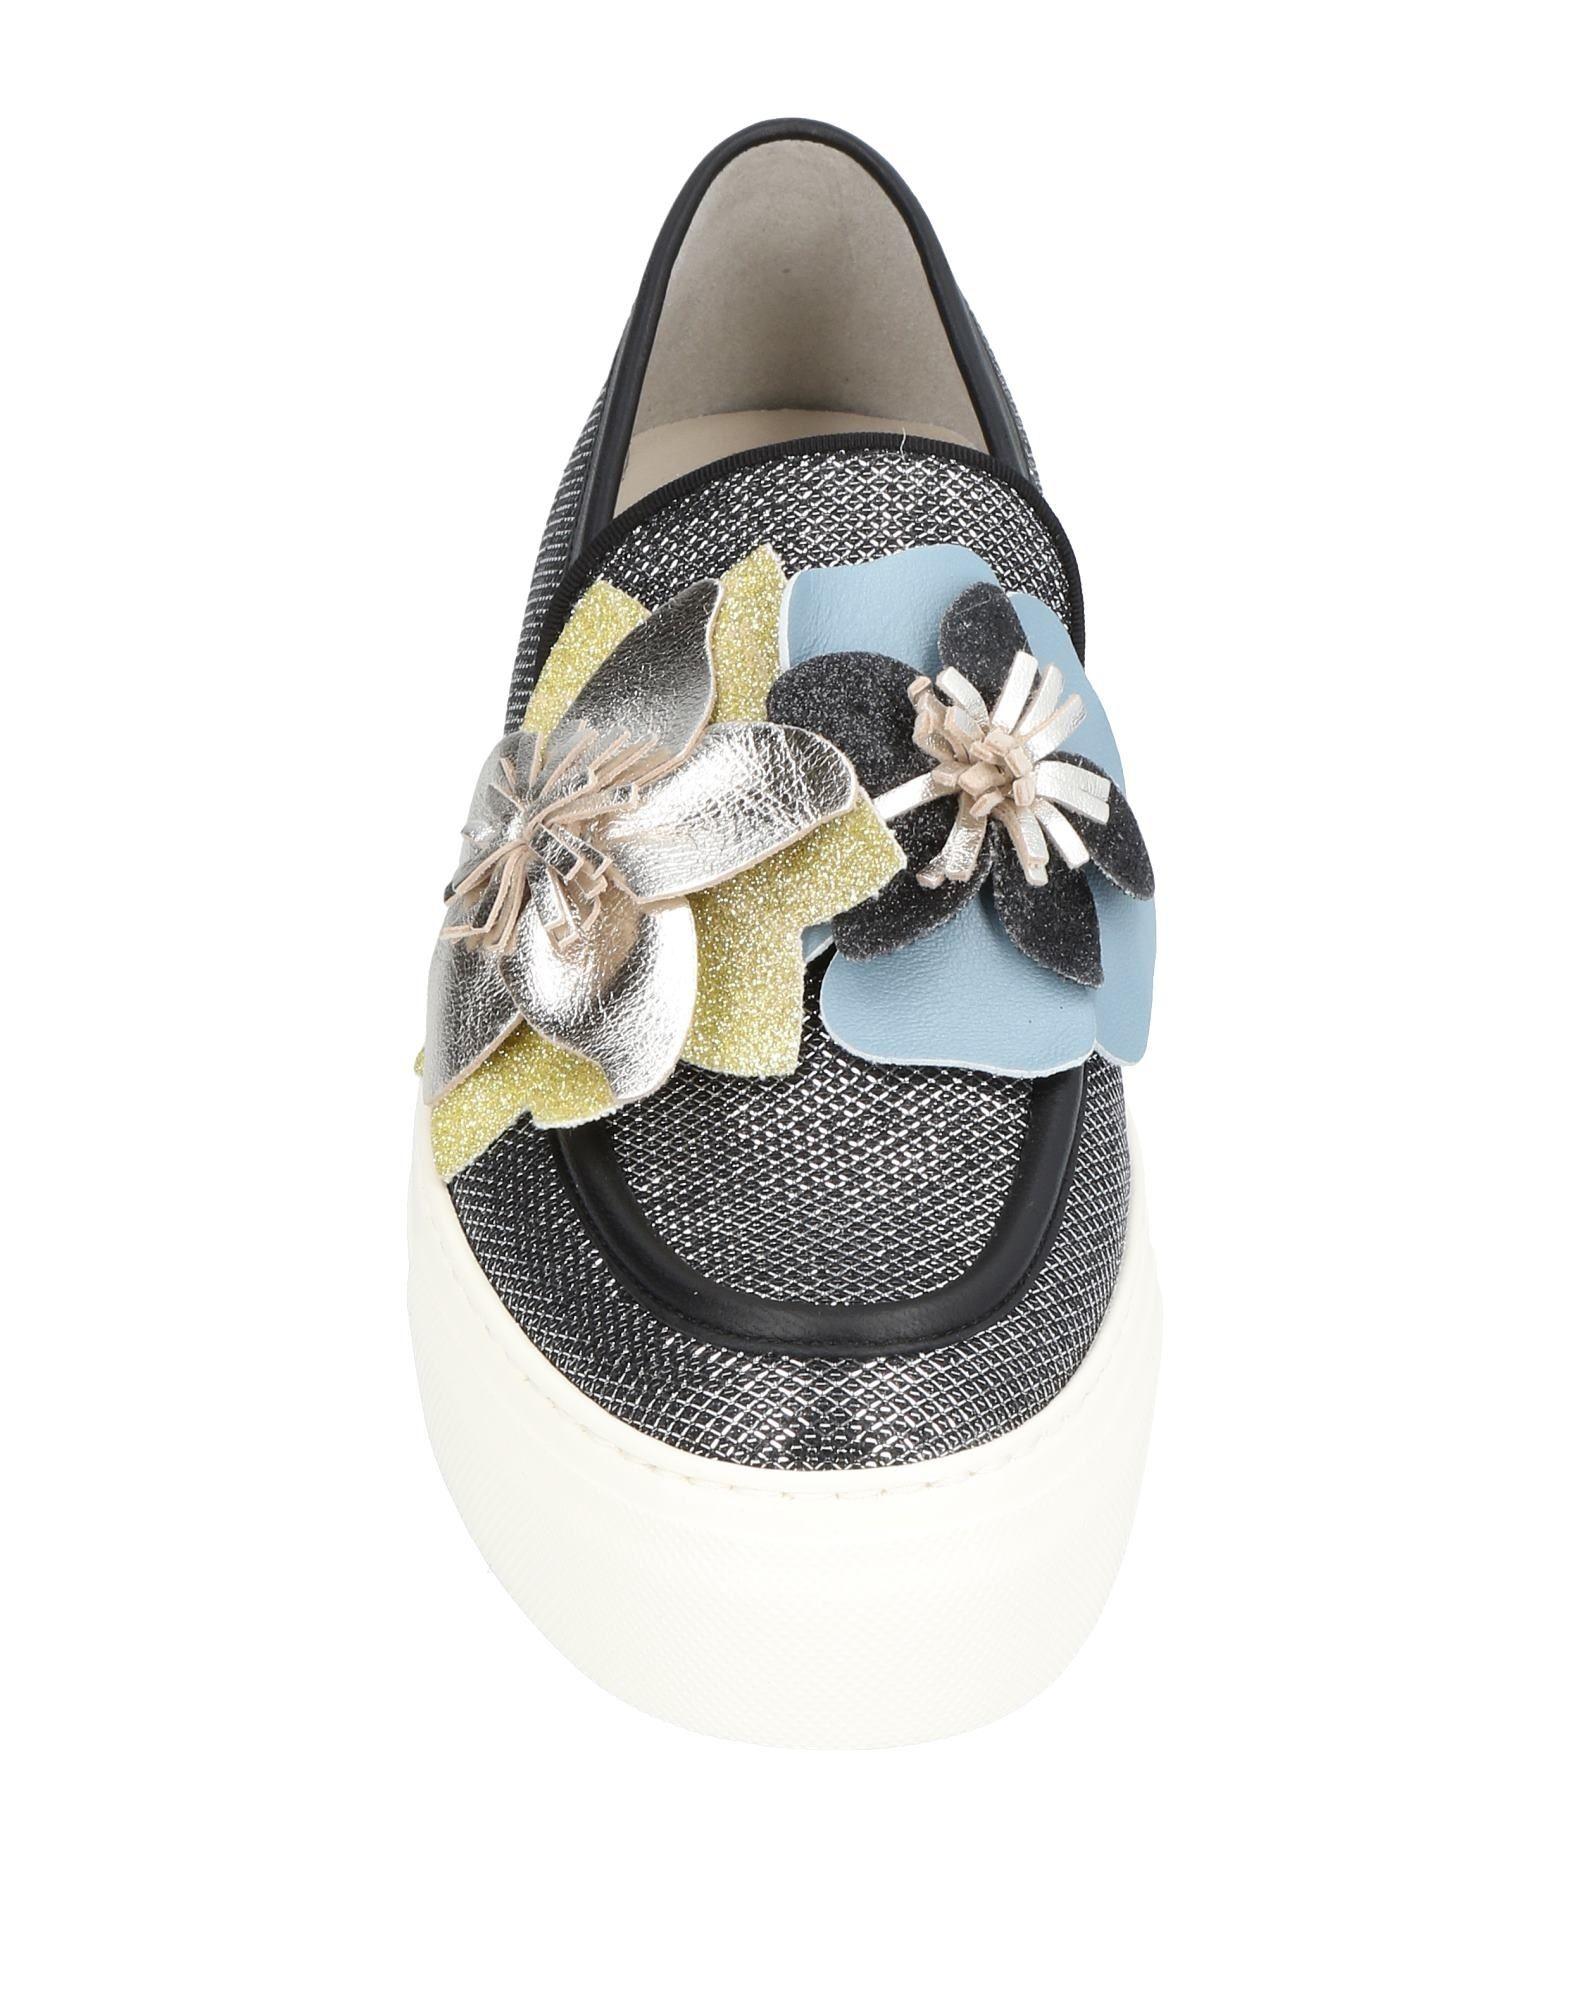 Stilvolle Turnschuhes billige Schuhe 181 By Alberto Gozzi Turnschuhes Stilvolle Damen 11455393XA 42fc06